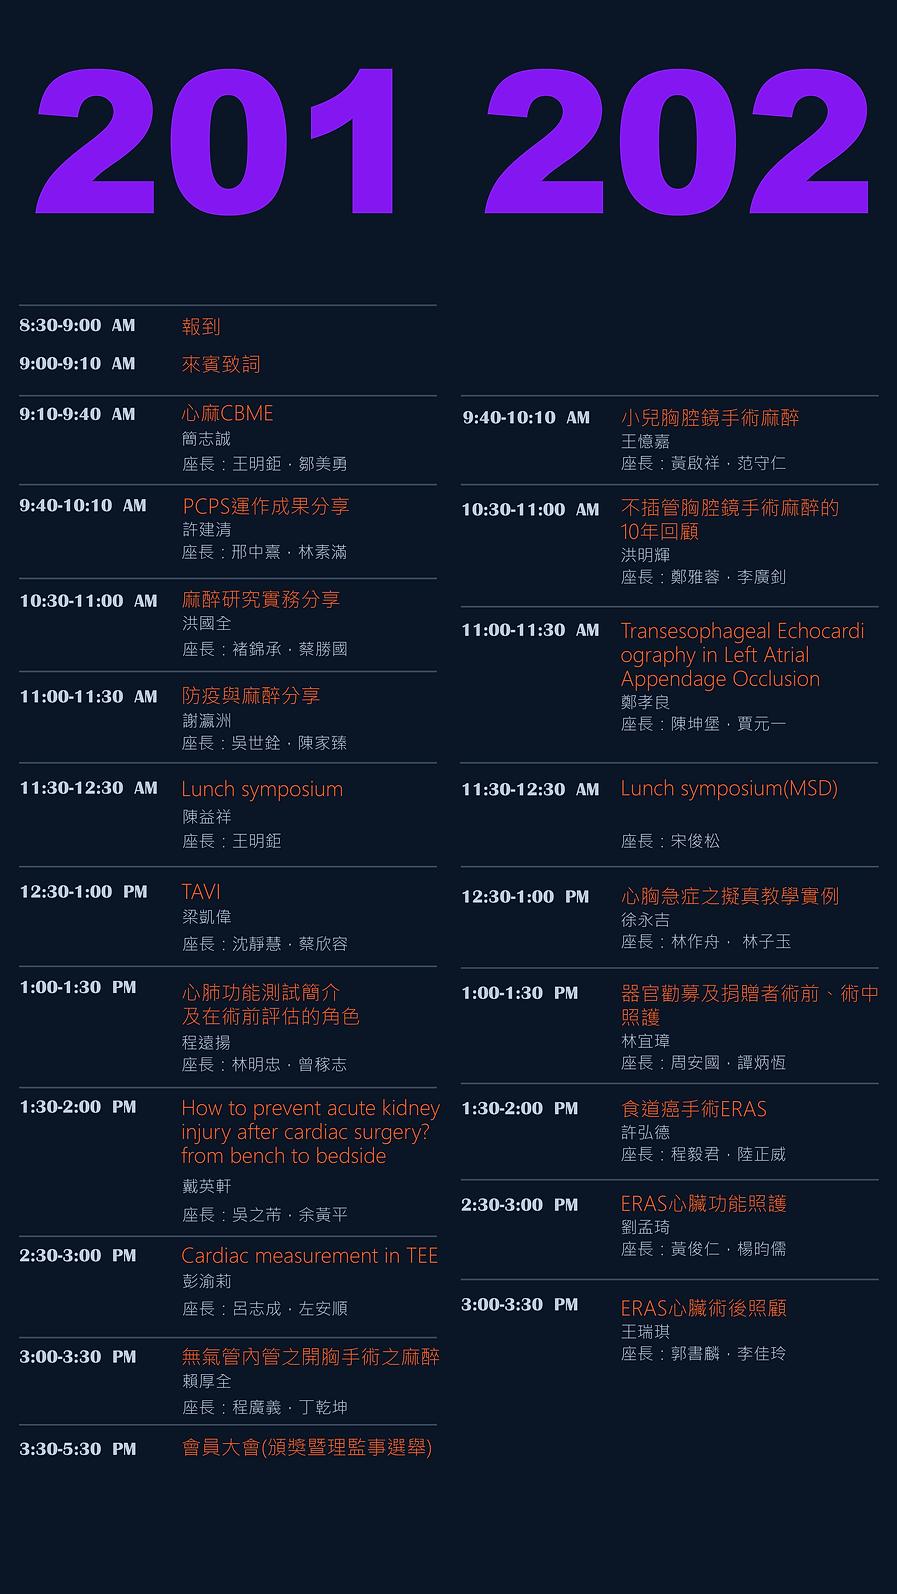 Agenda(201_202)_工作區域 1.png